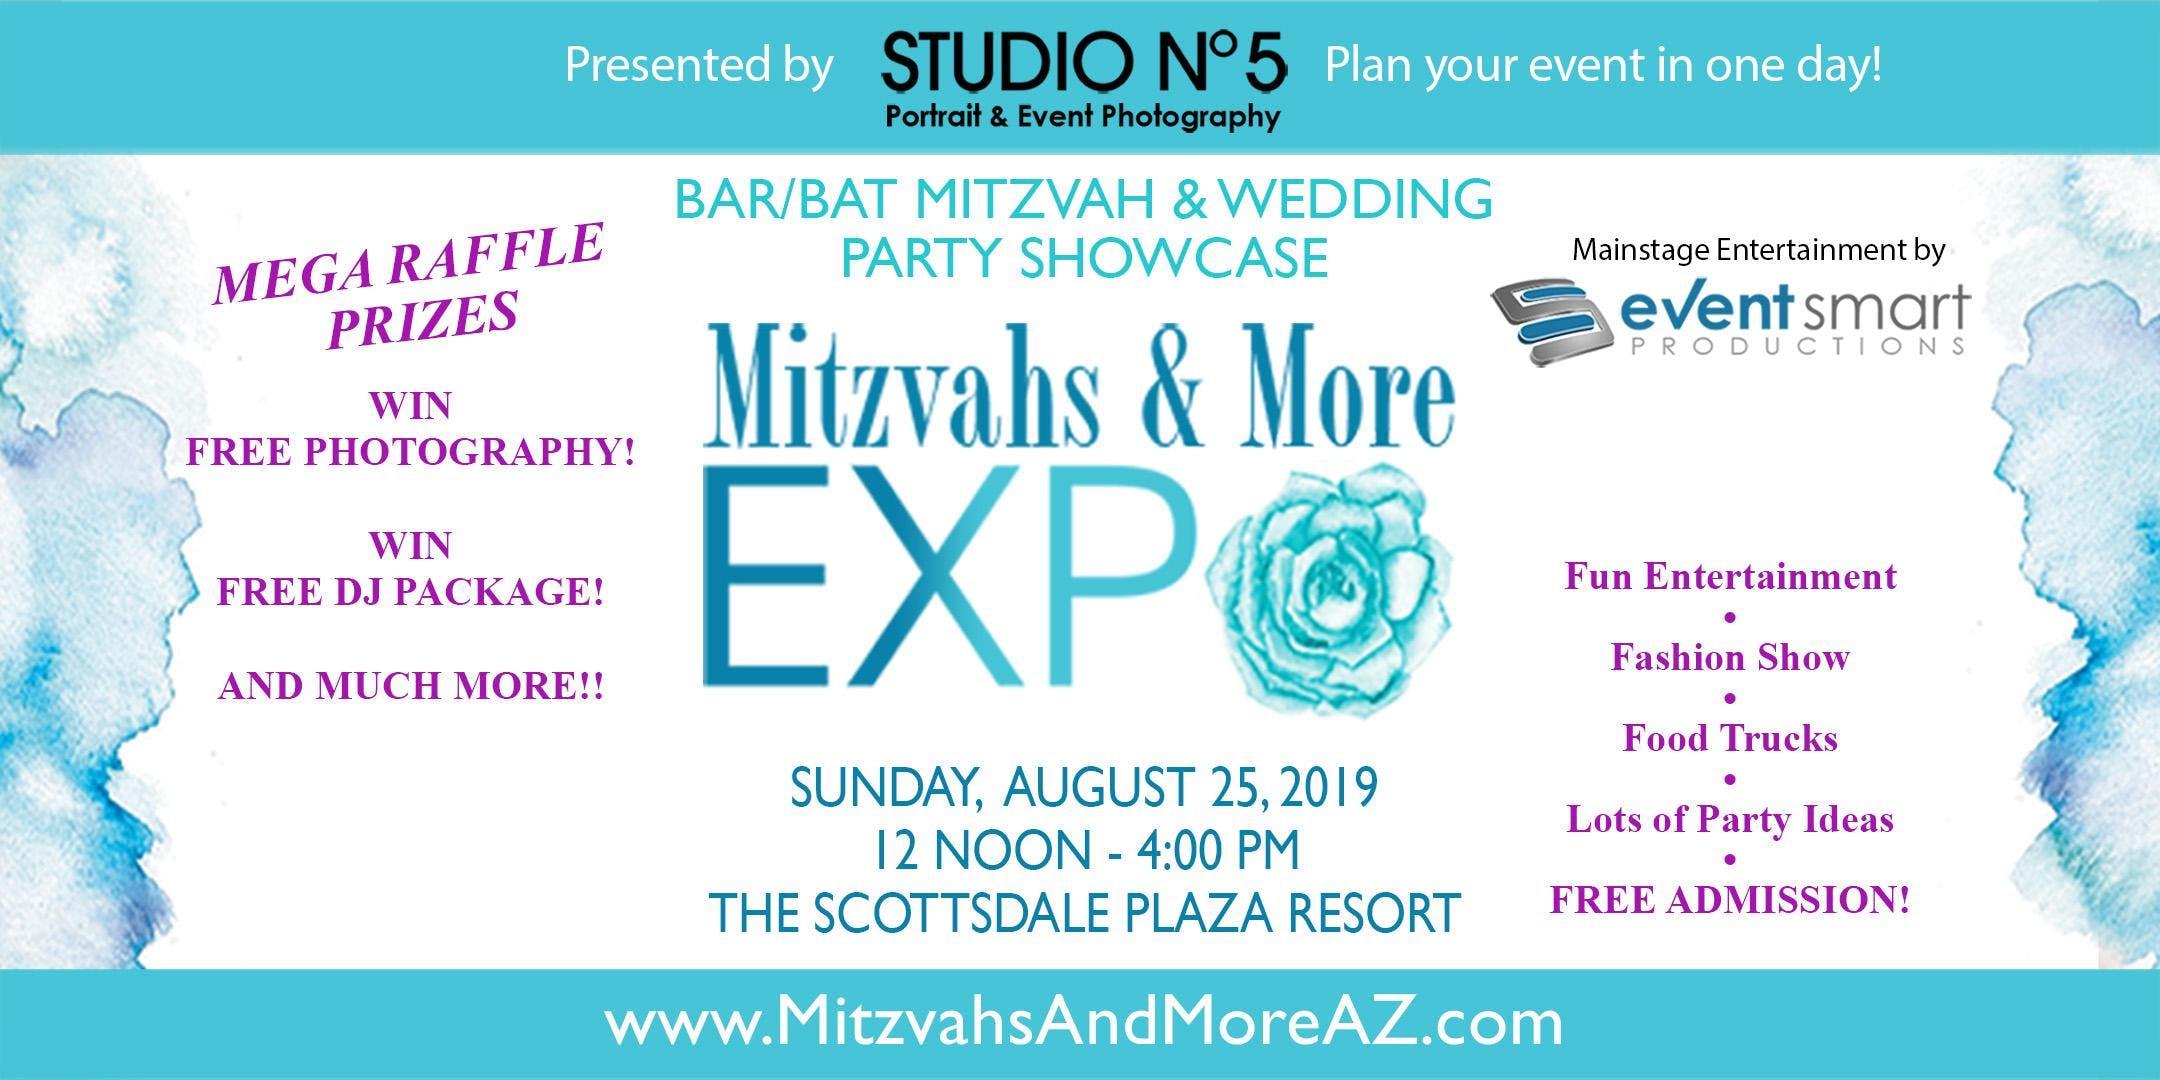 8th Annual Mitzvahs & More Expo - Bar/Bat Mitzvah & Wedding Planning Showcase